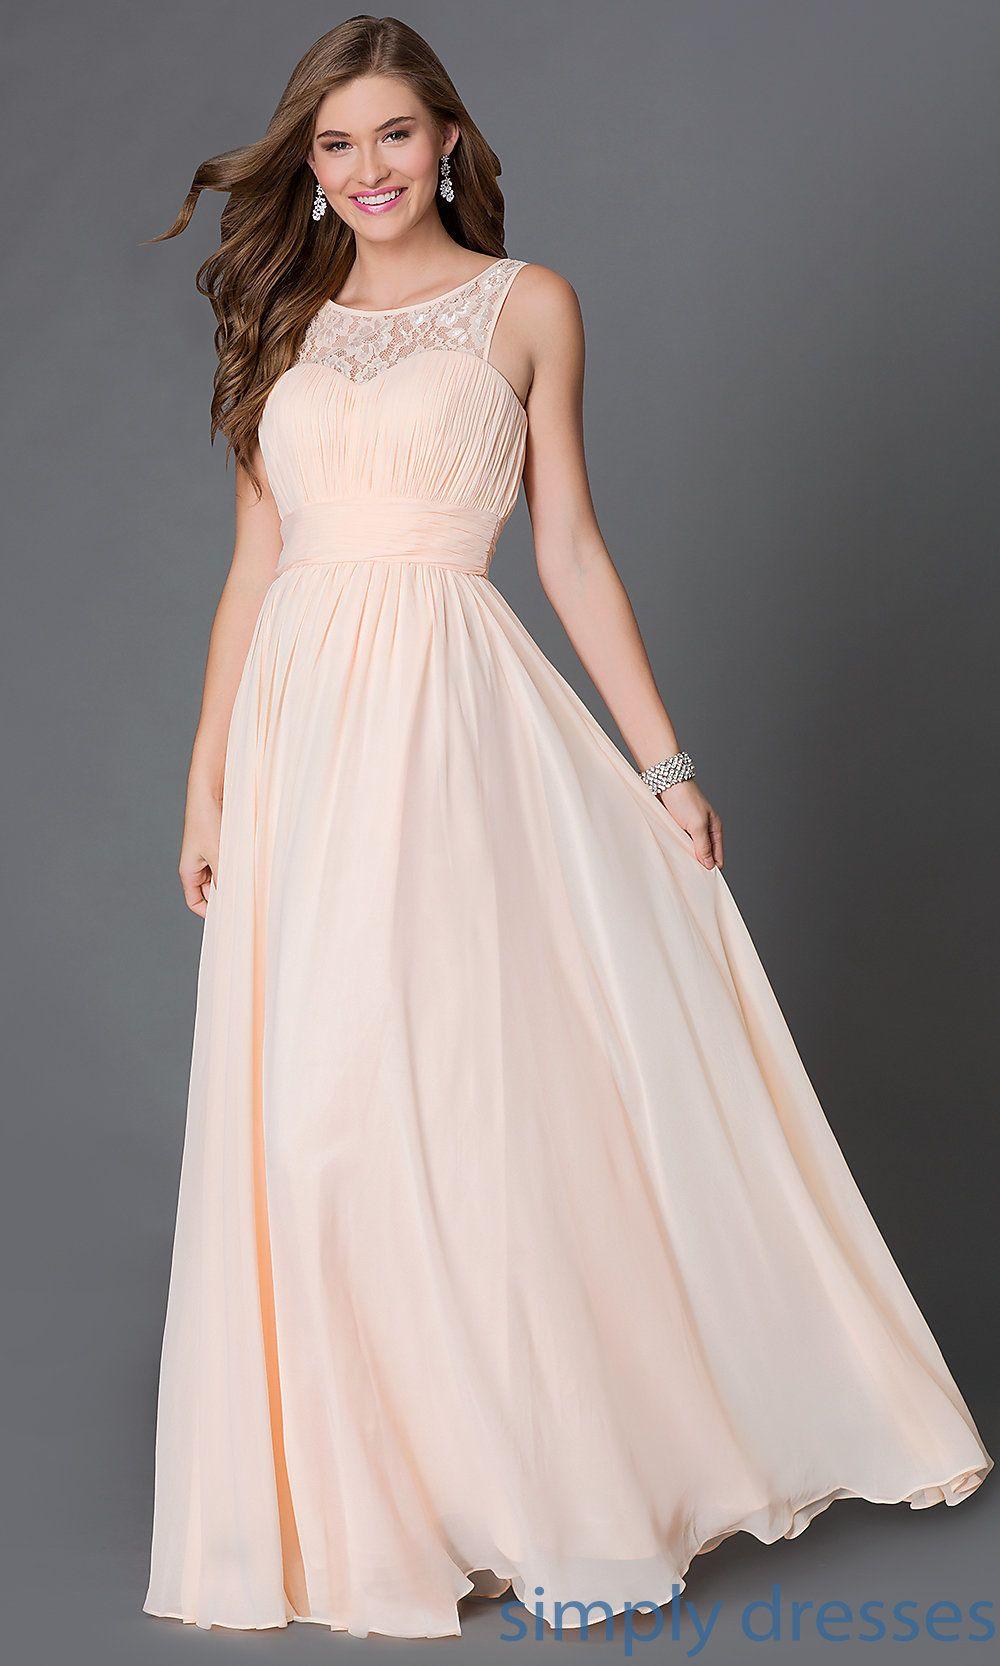 Sleeveless long corset dress plus size dresses pinterest dress